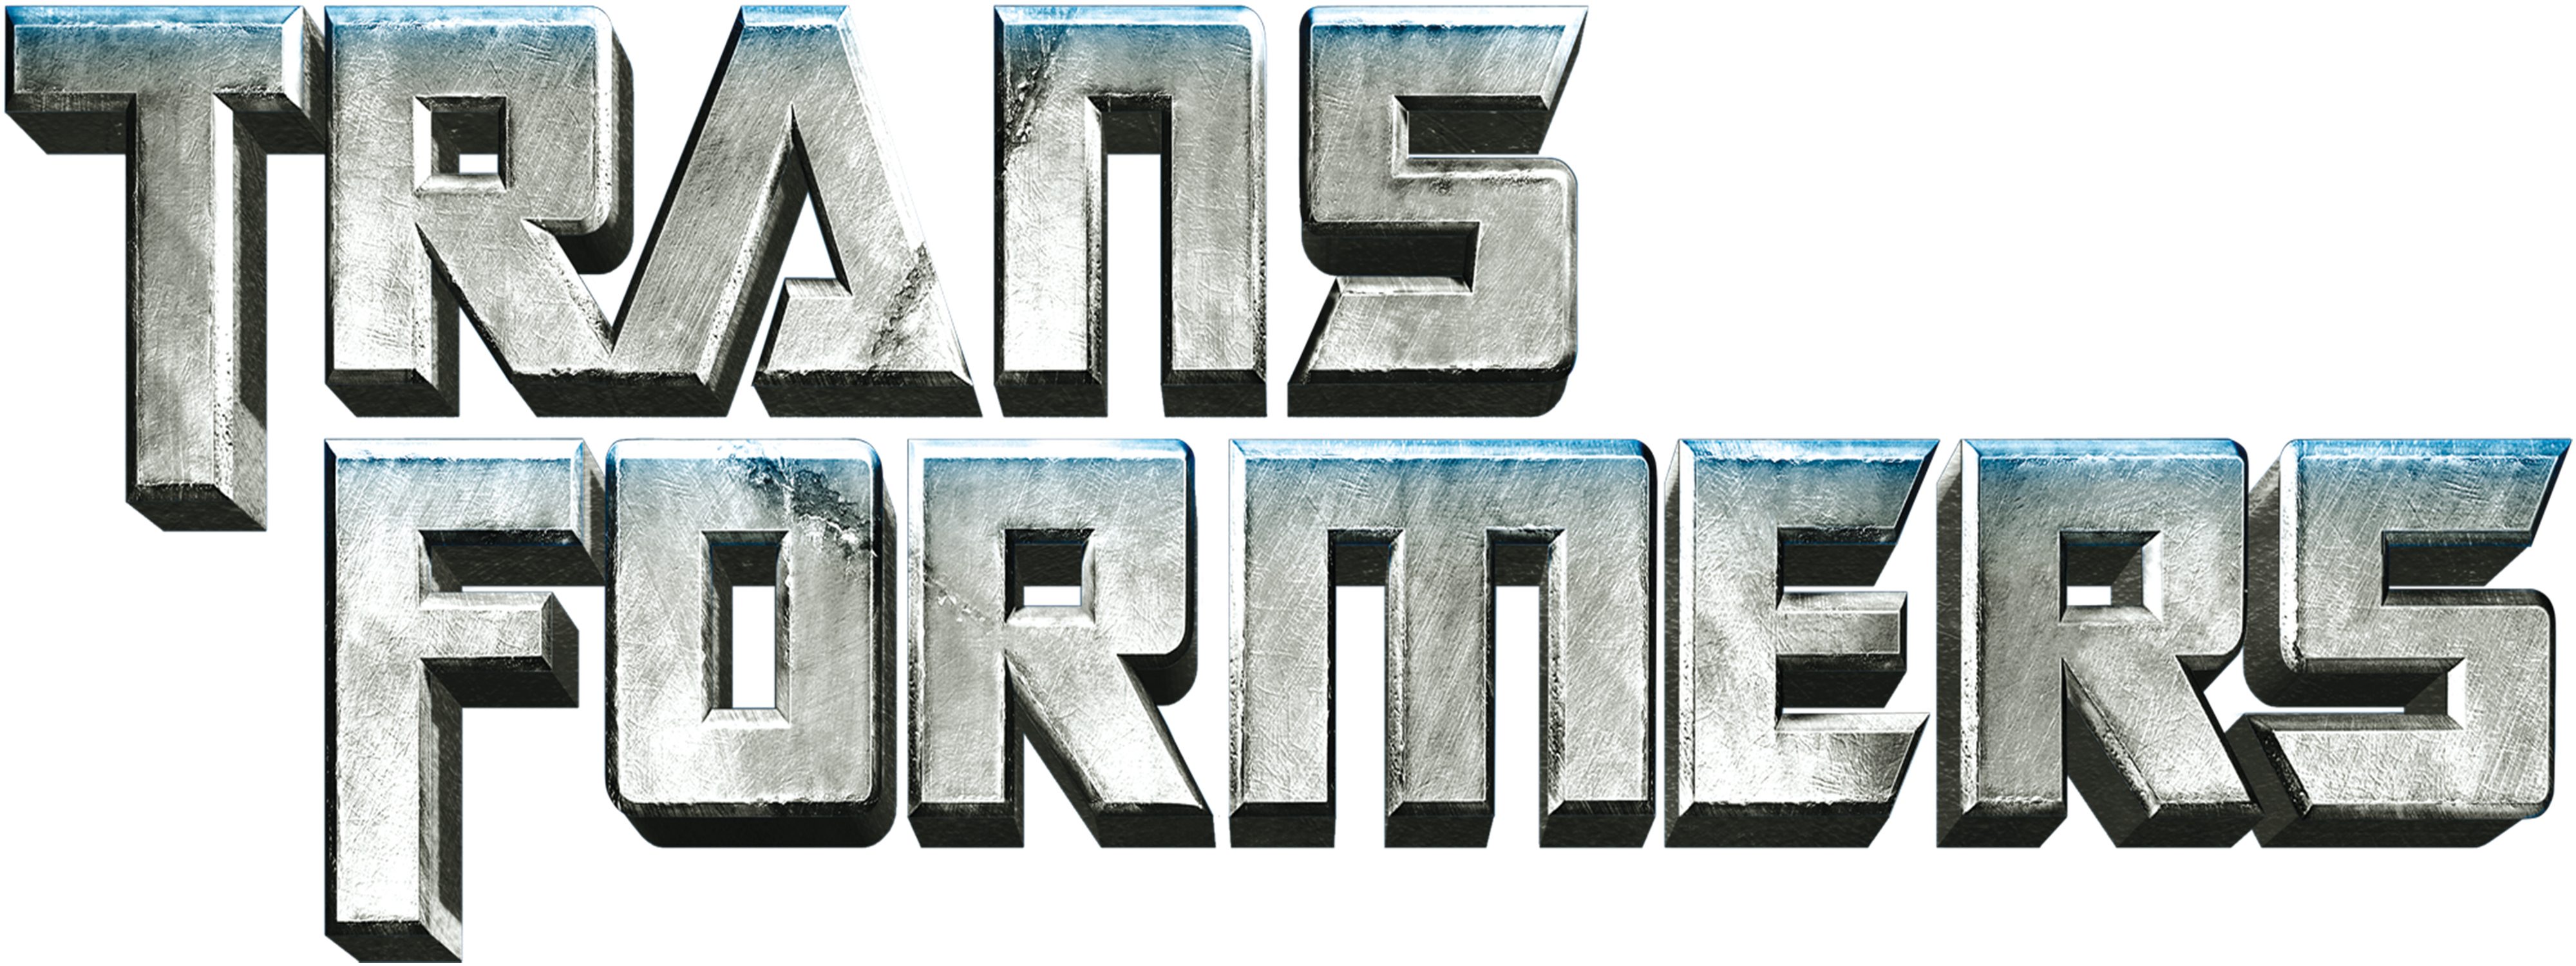 Download Transformers Logo PNG Images Transparent Gallery. Advertisement - Transformers Logo PNG